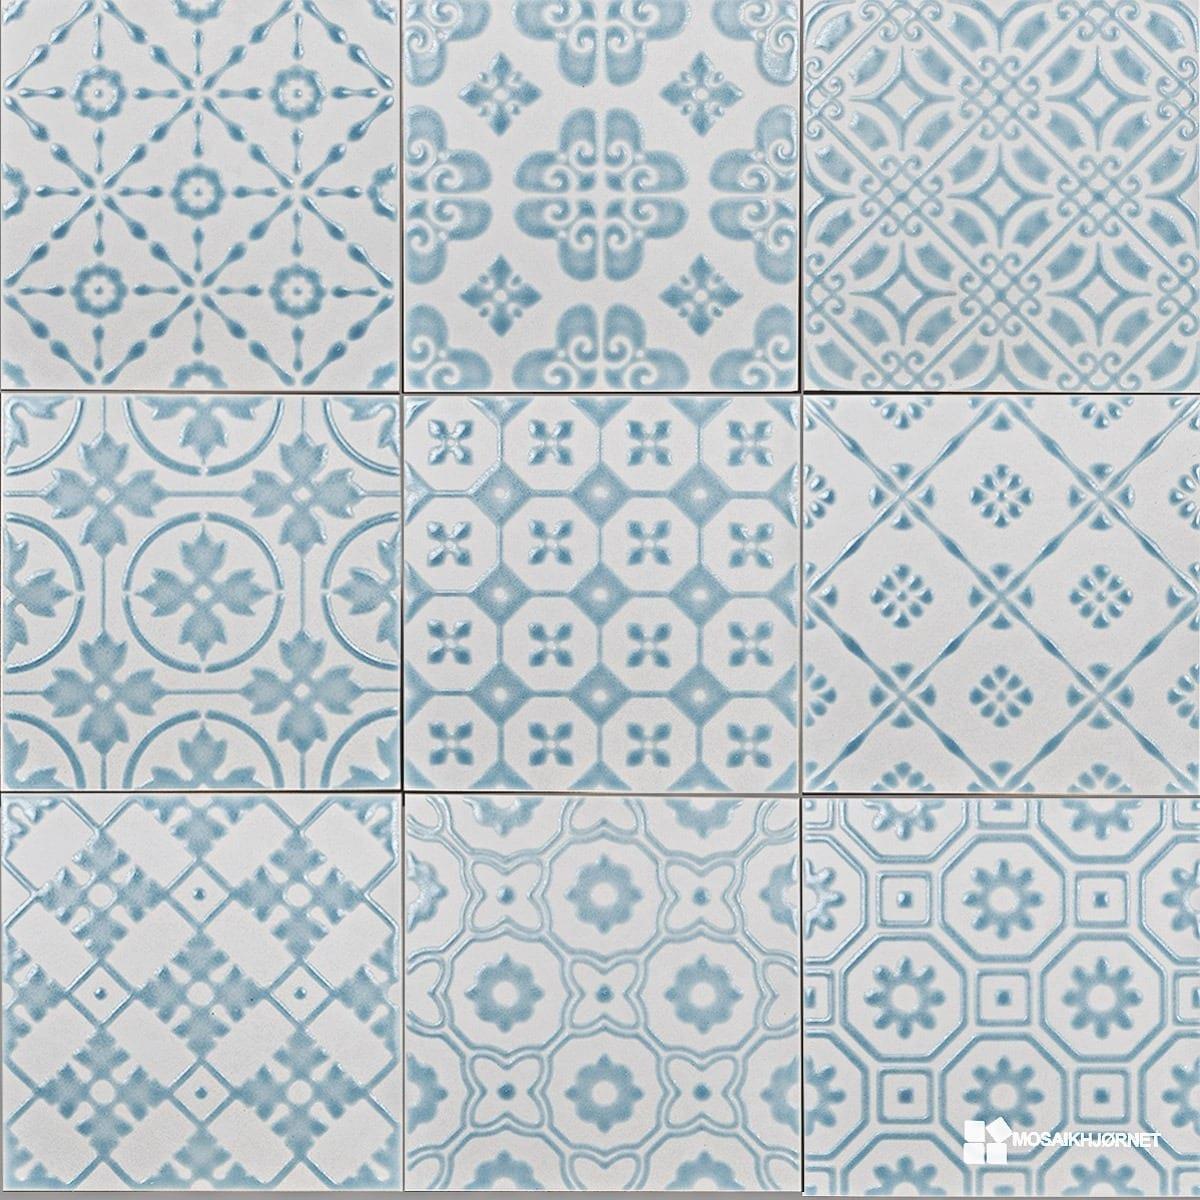 #457086 Mest effektive 20x20 Bon Ton Turkis På Hvid Mosaikhjørnet Fliser Klinker Og Mosaik Til  Fliser Til Bad Og Køkken 4805 120012004805